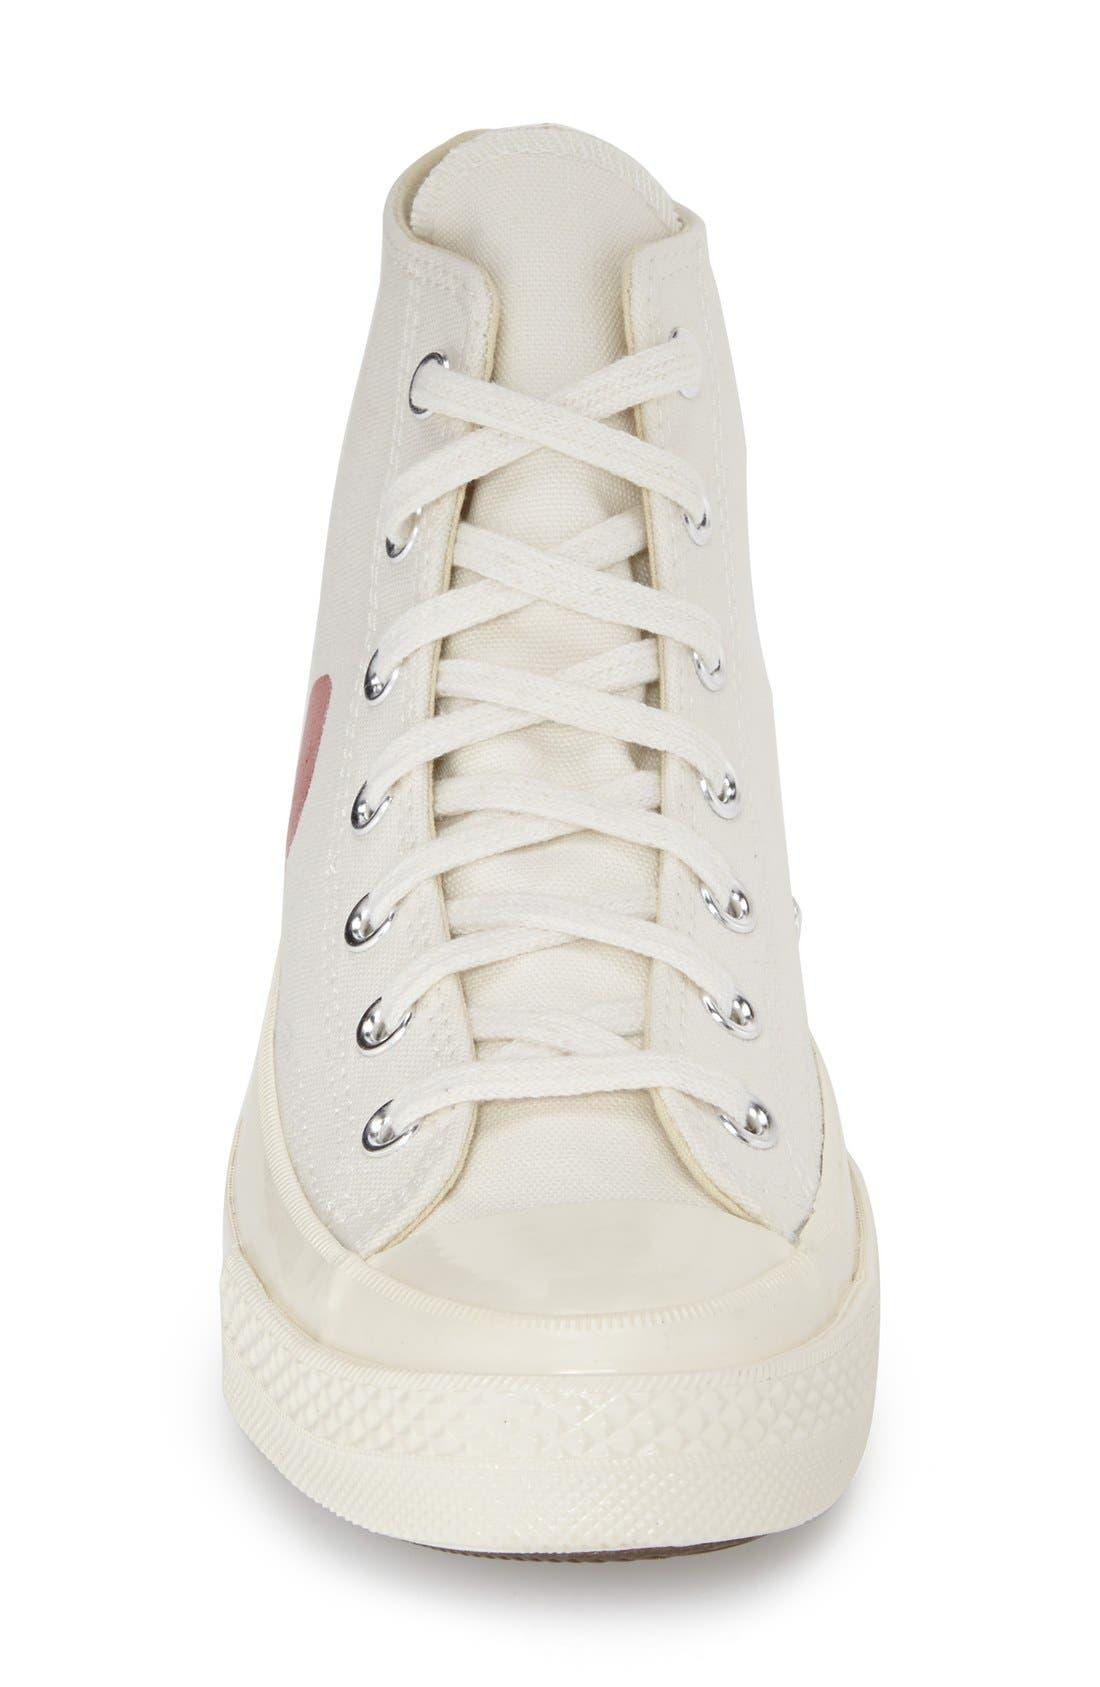 Comme des Garçons PLAYx Converse Chuck Taylor<sup>®</sup> - Hidden Heart High TopSneaker,                             Alternate thumbnail 3, color,                             White Canvas